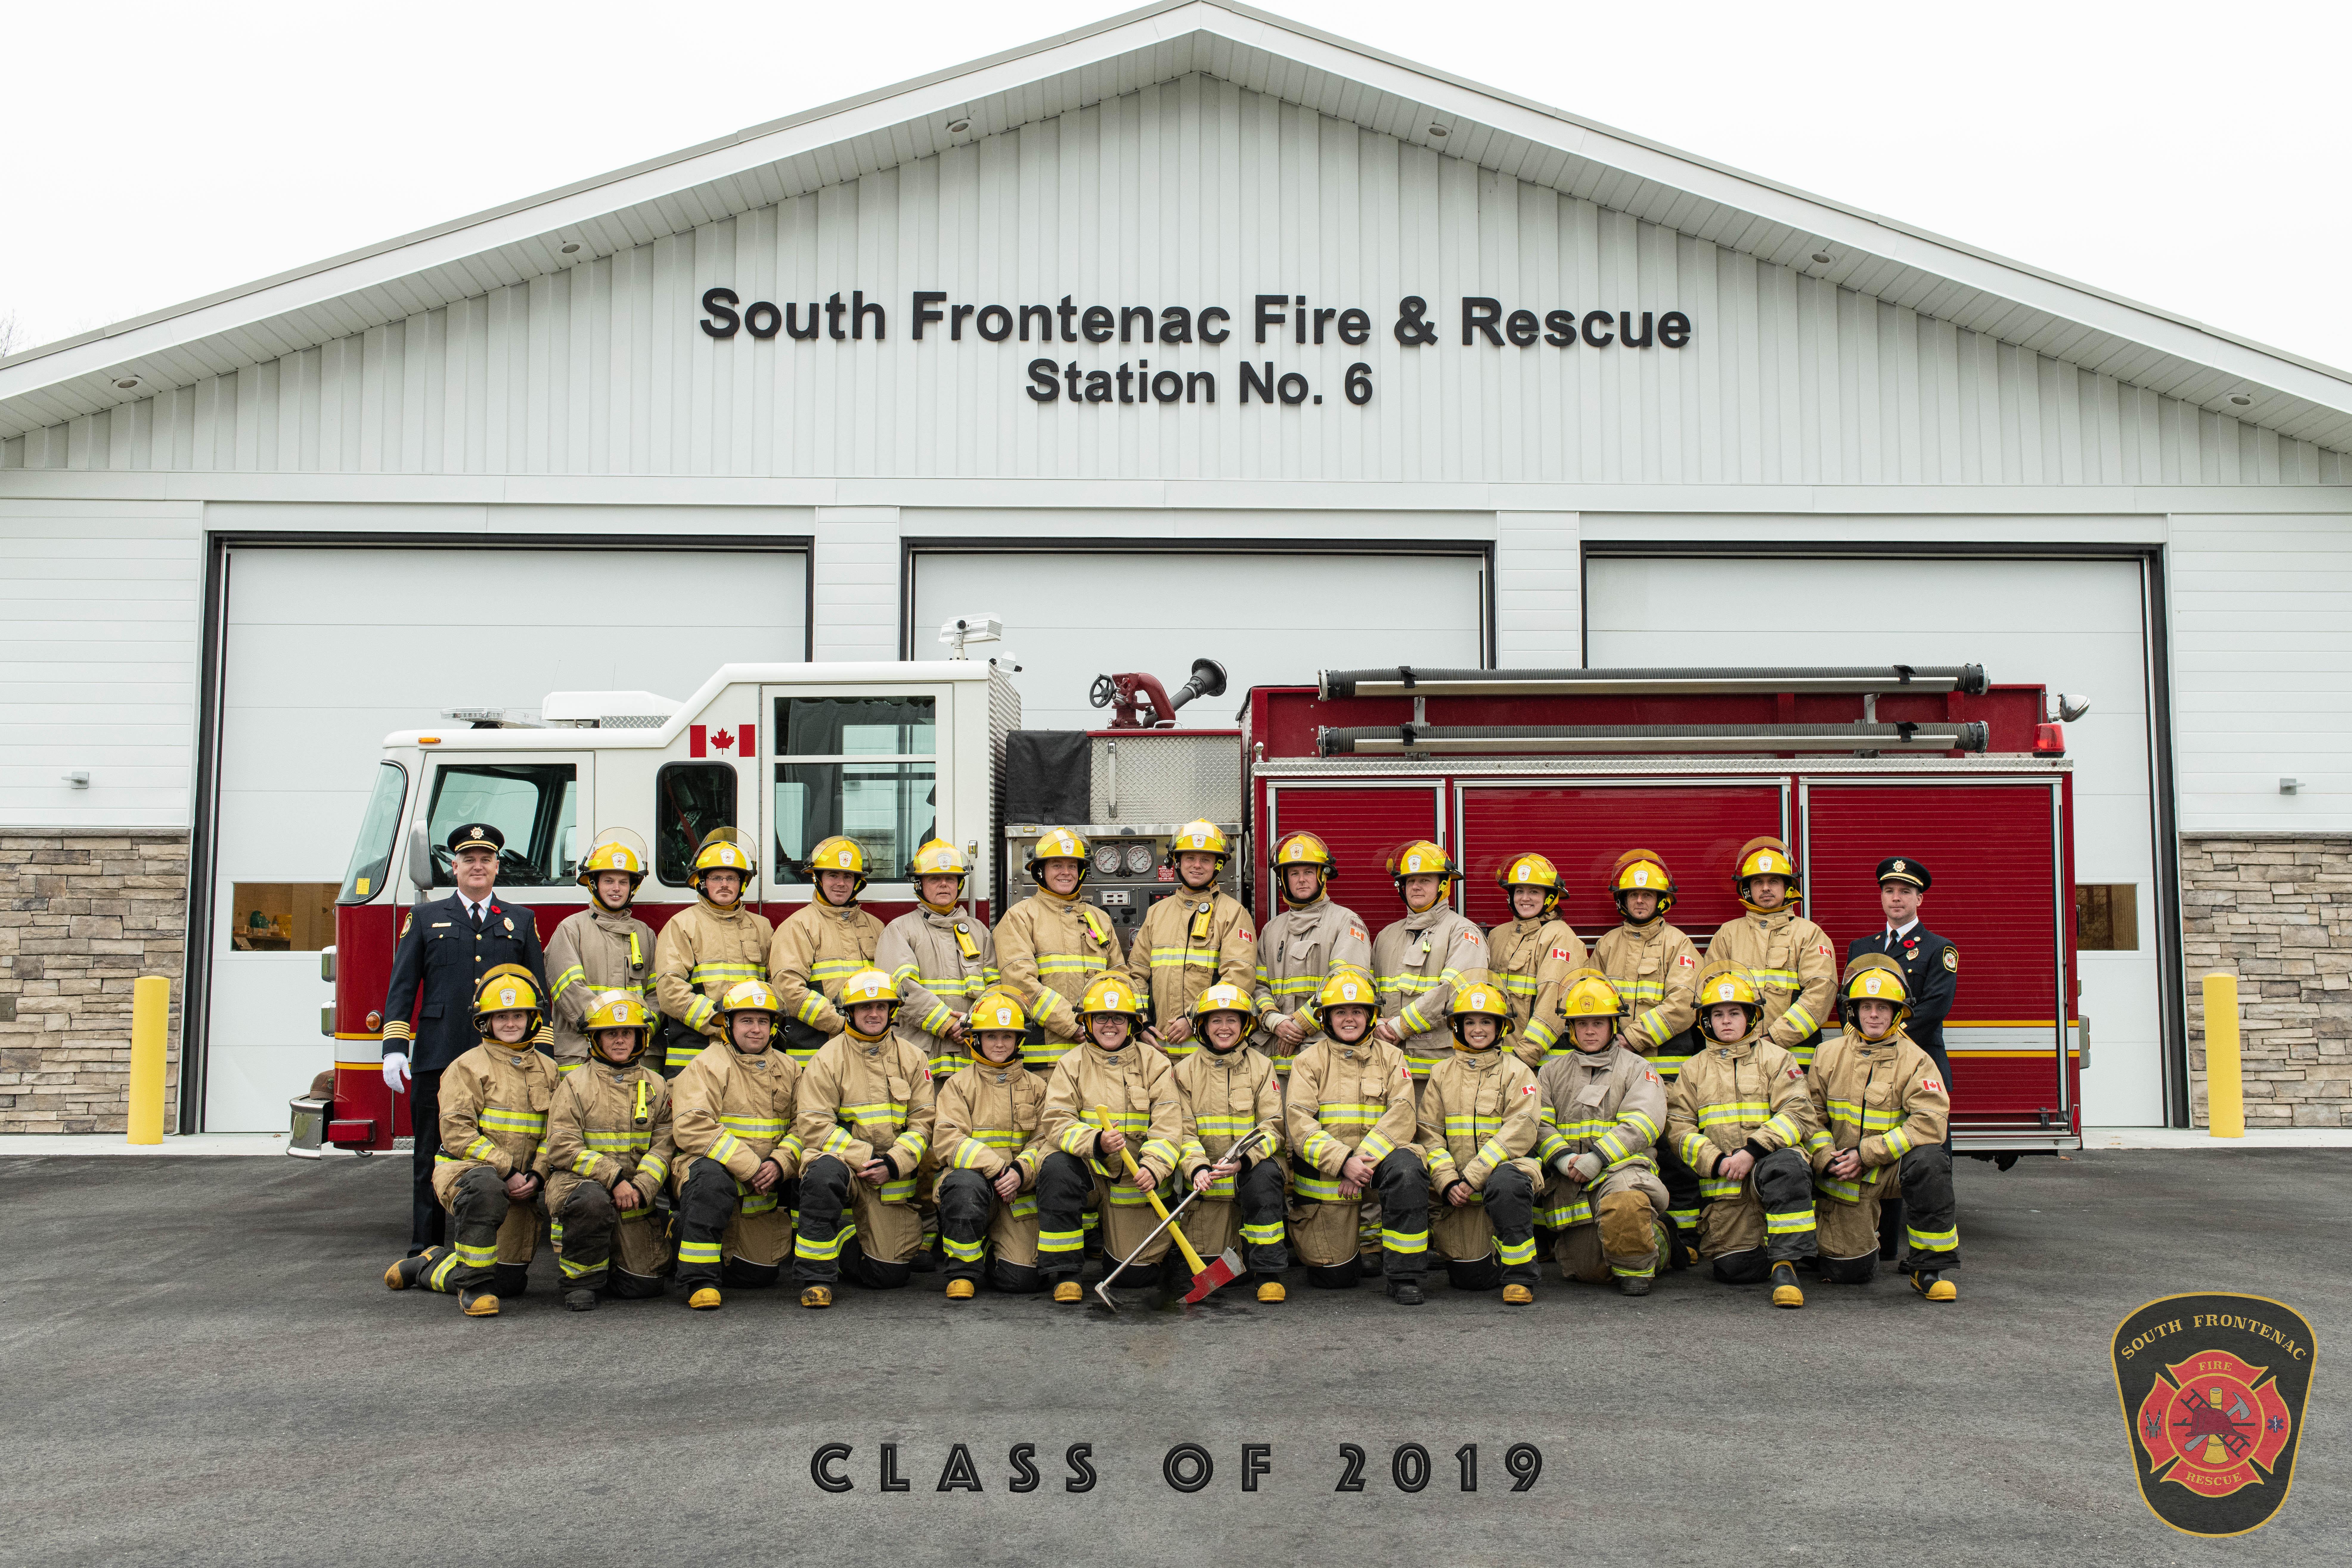 VFF Class of 2019